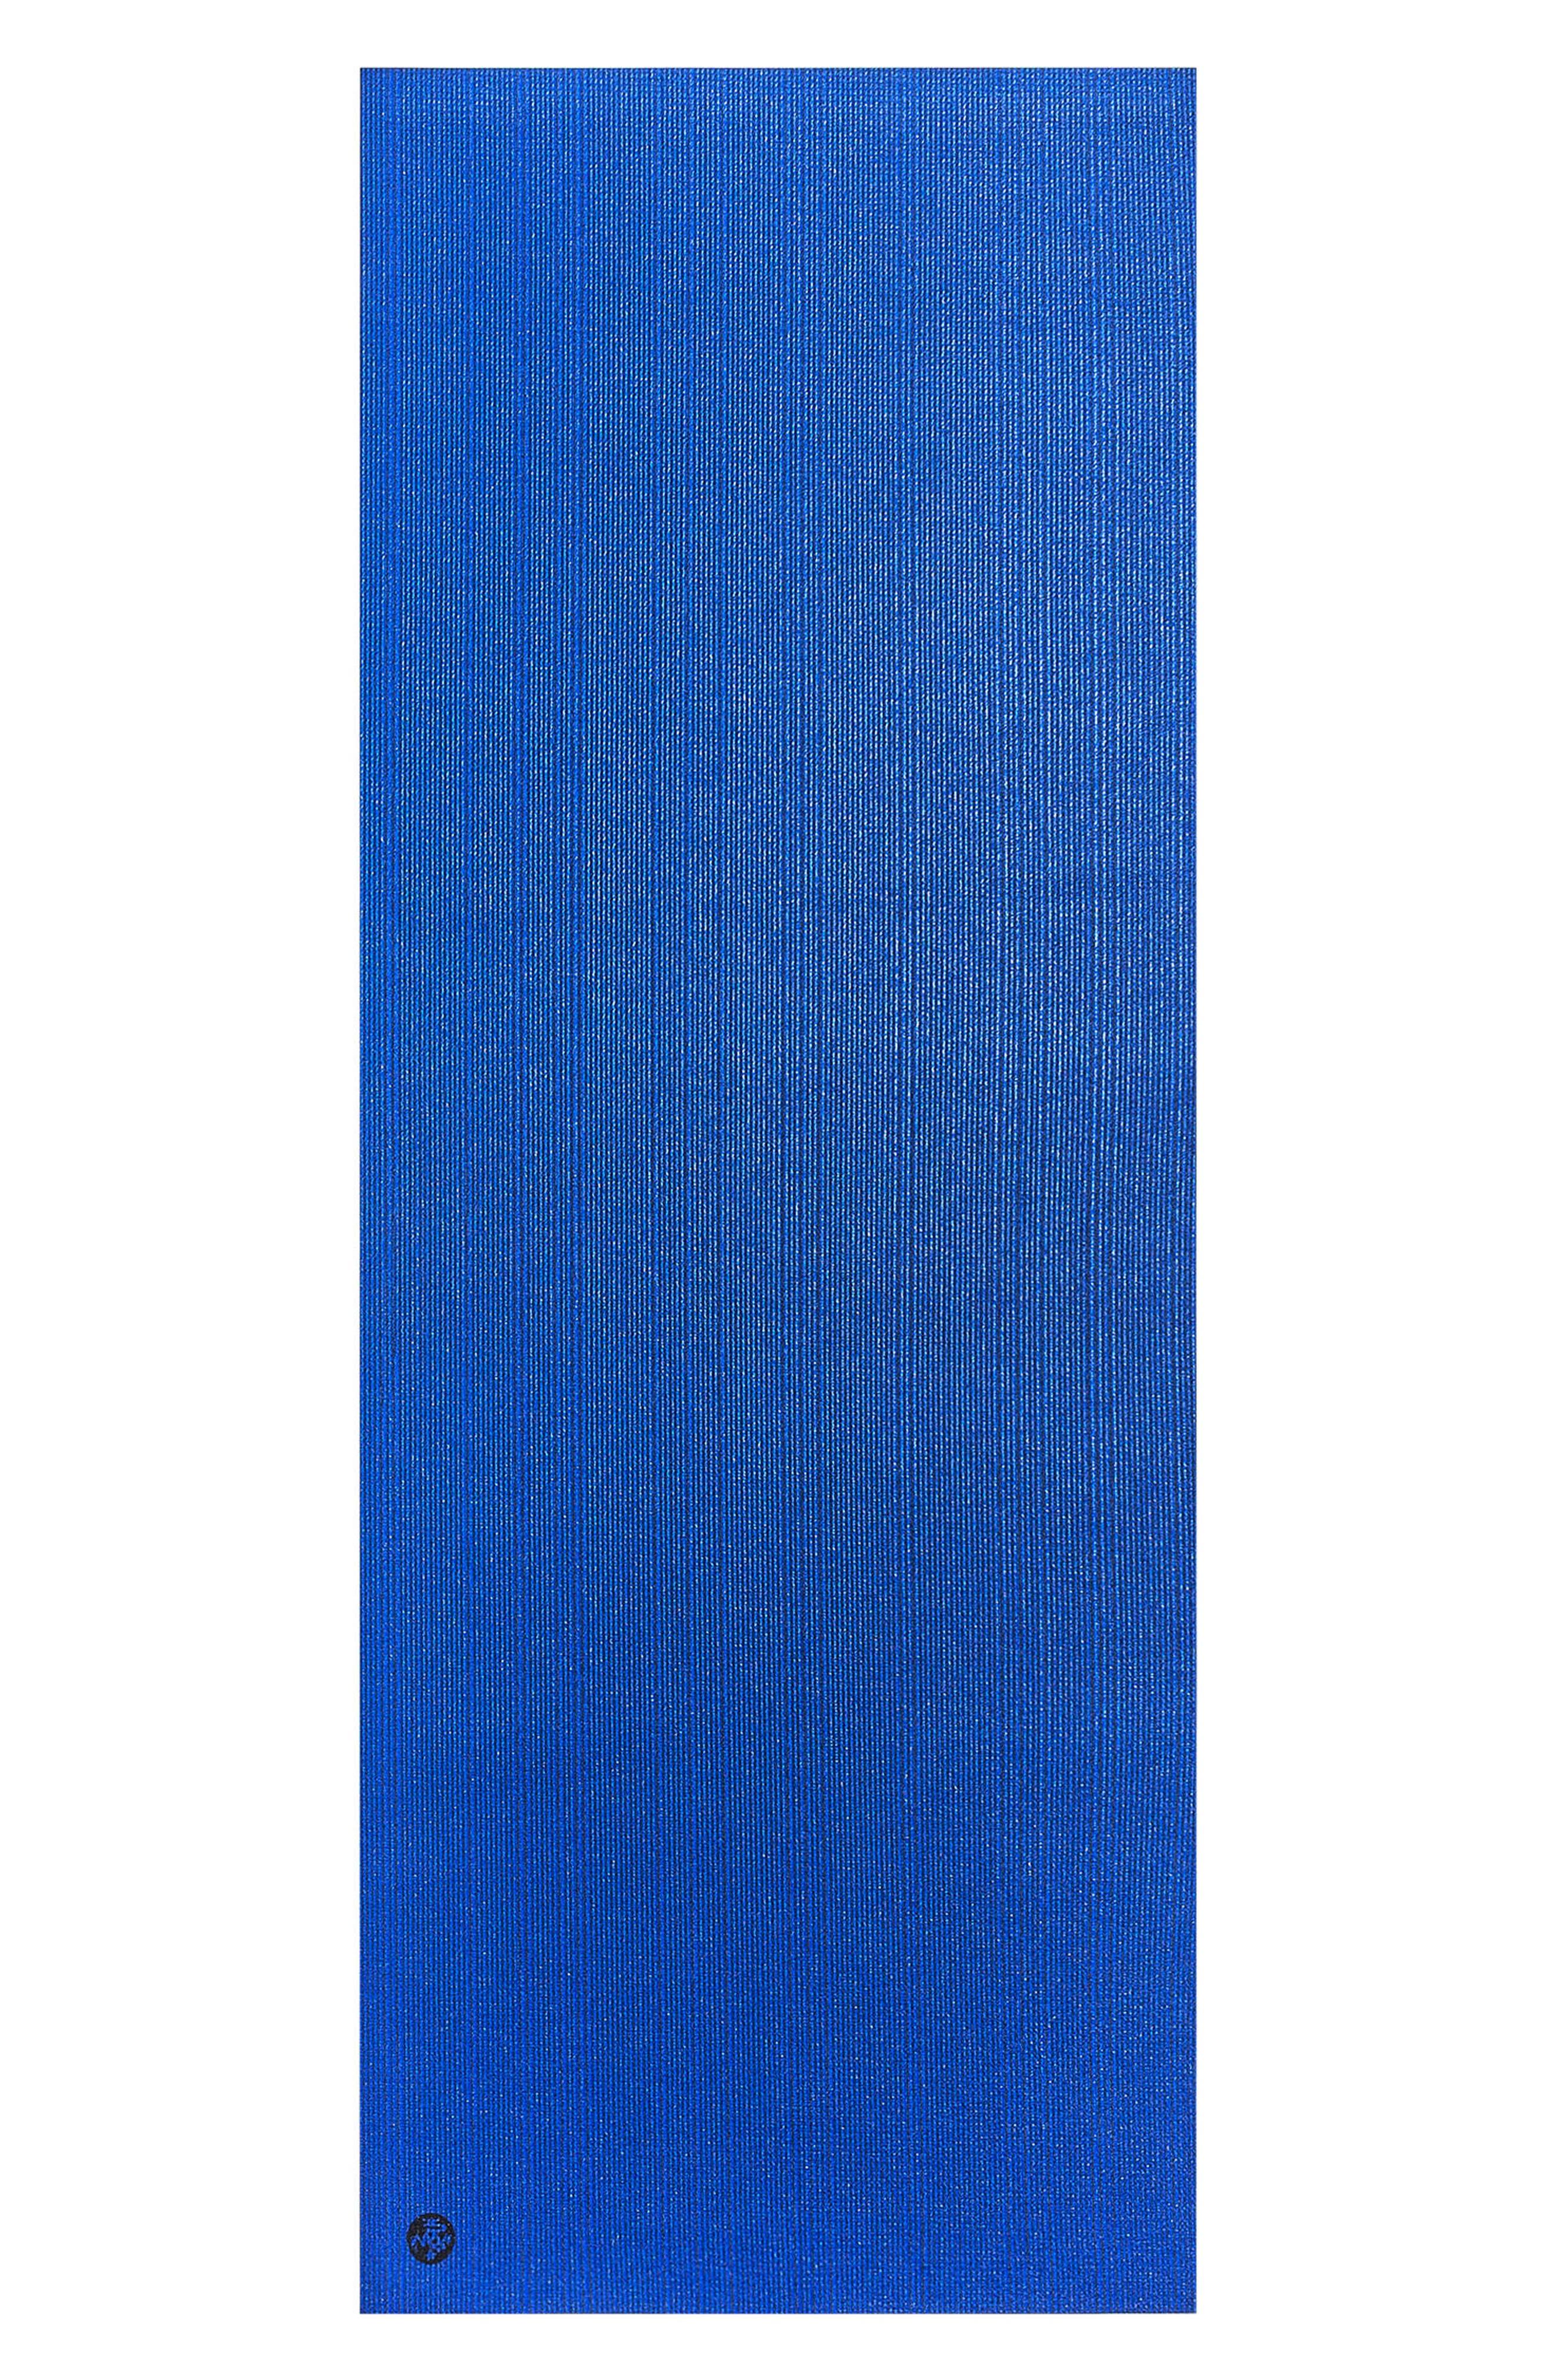 'PRO<sup>®</sup>' Yoga Mat,                             Main thumbnail 1, color,                             FOREVER